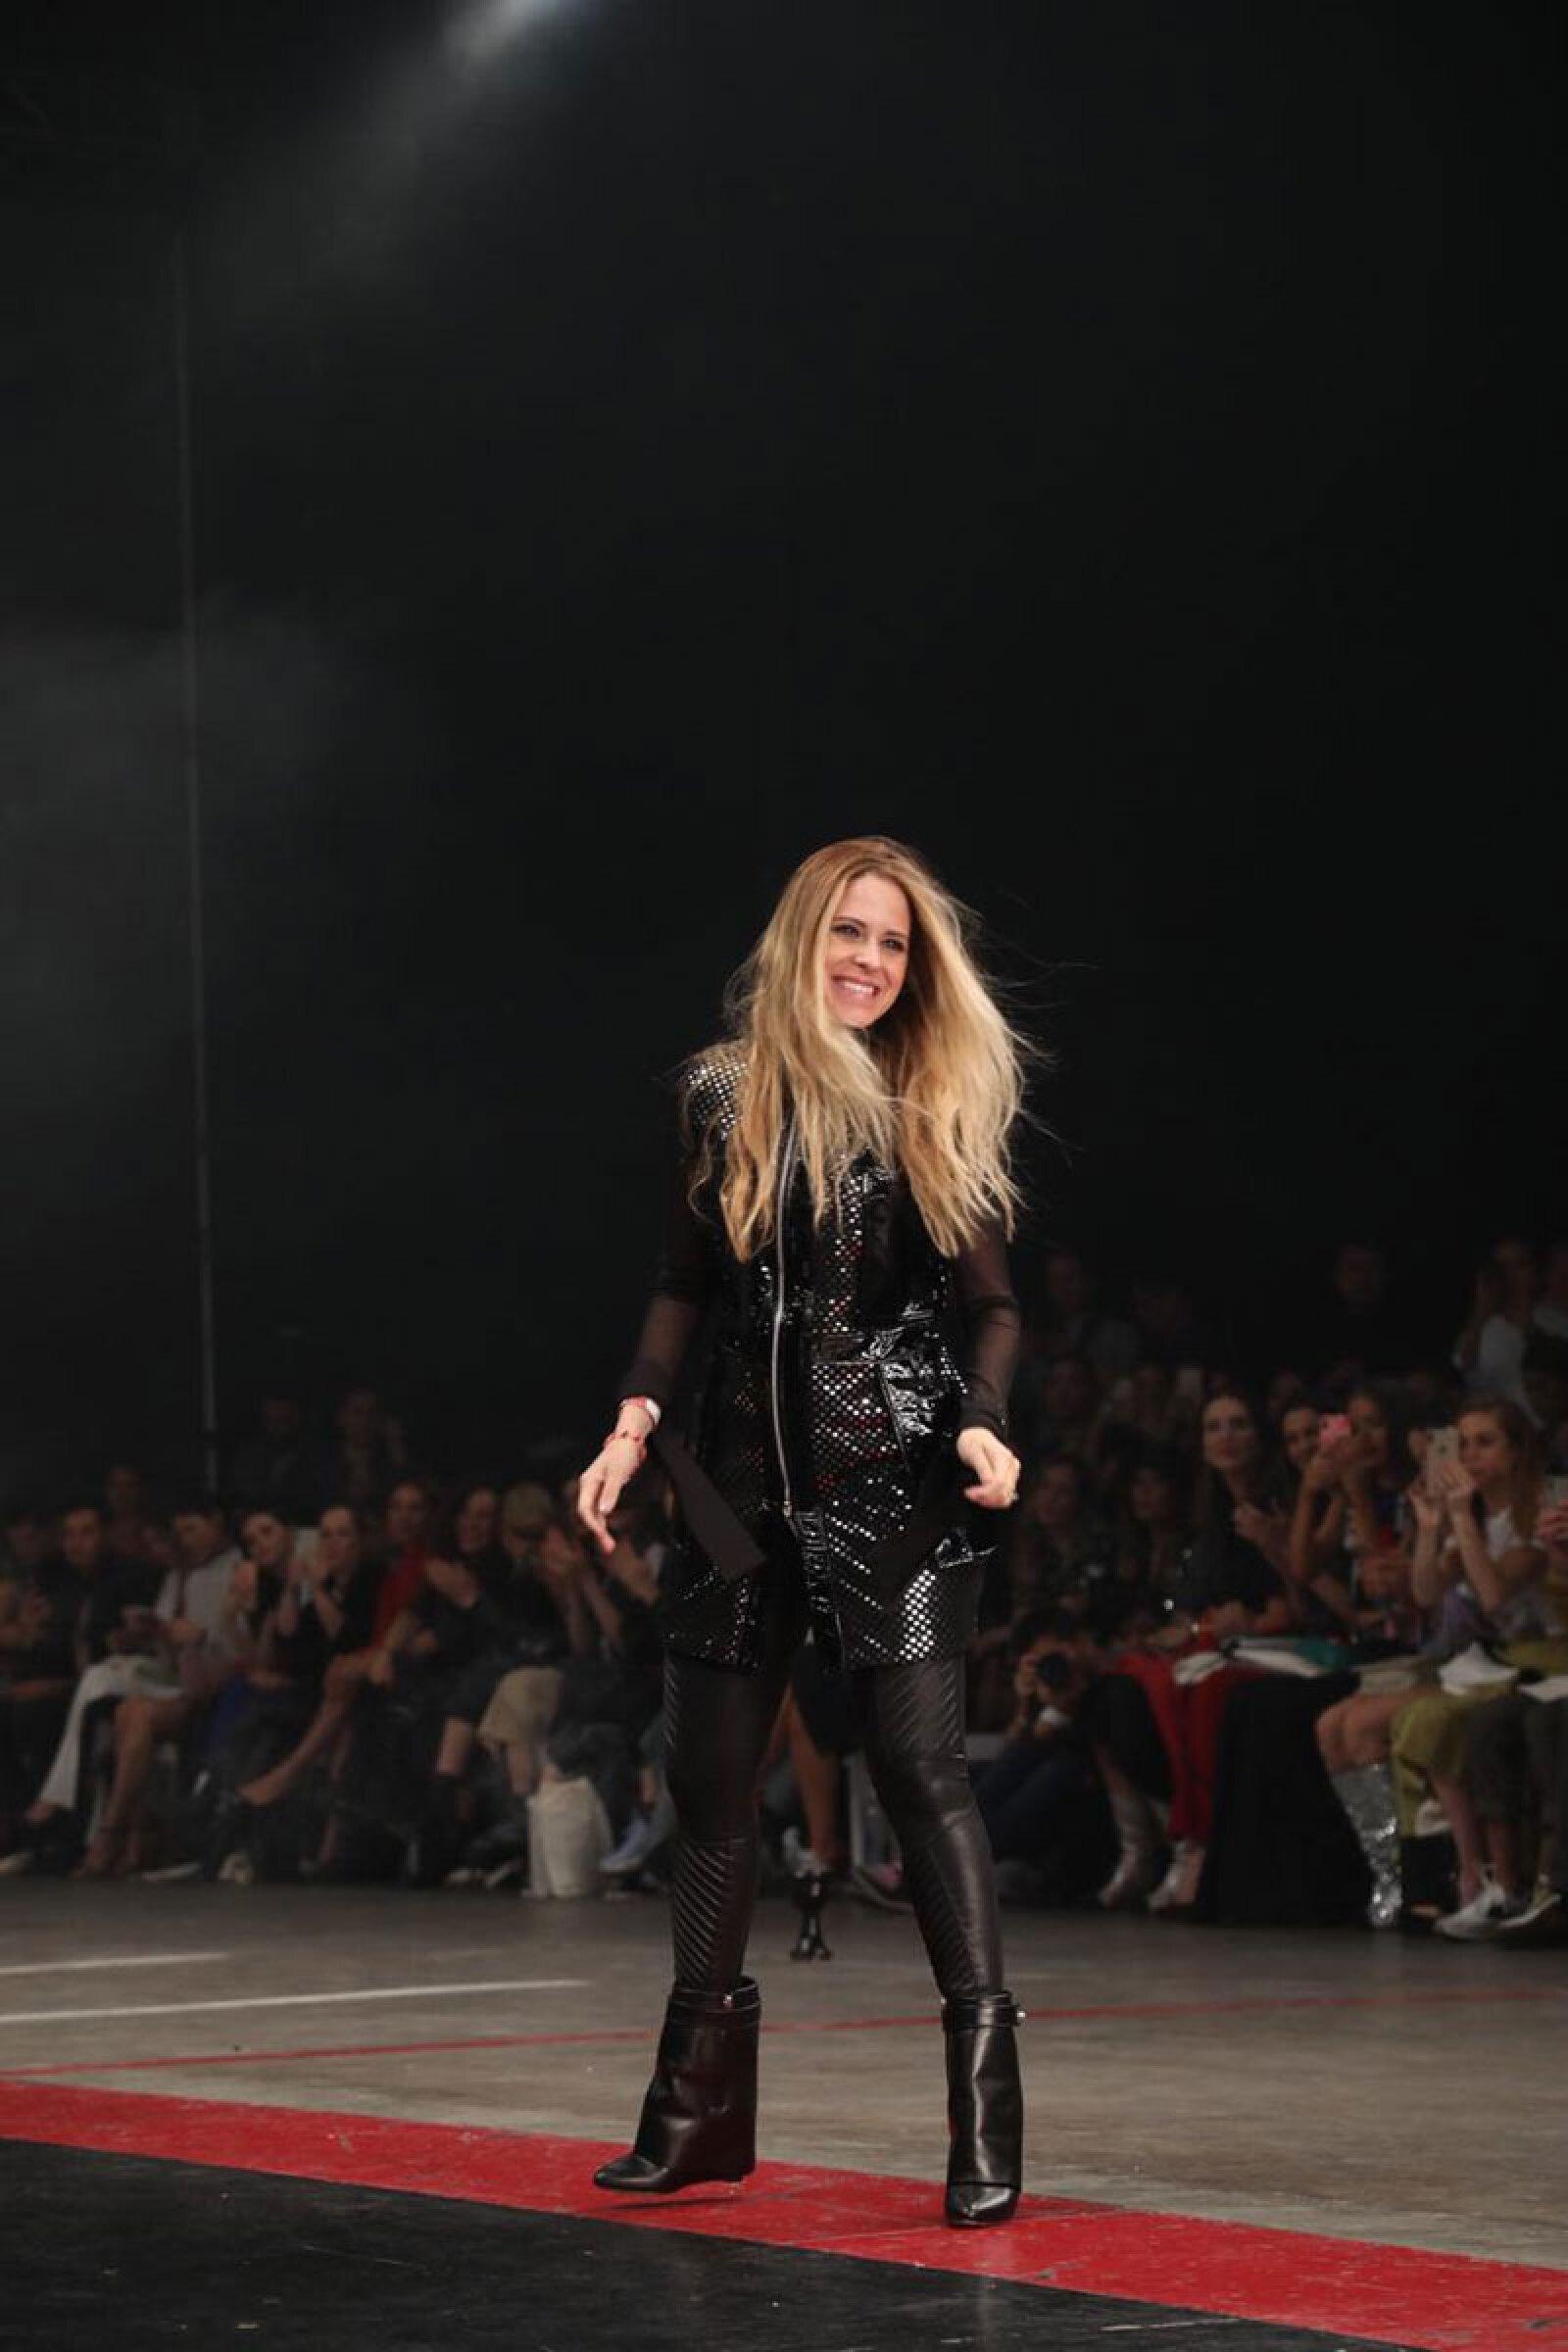 Vero-Diaz-MBFWMx-Designer-On-The-Catwalk